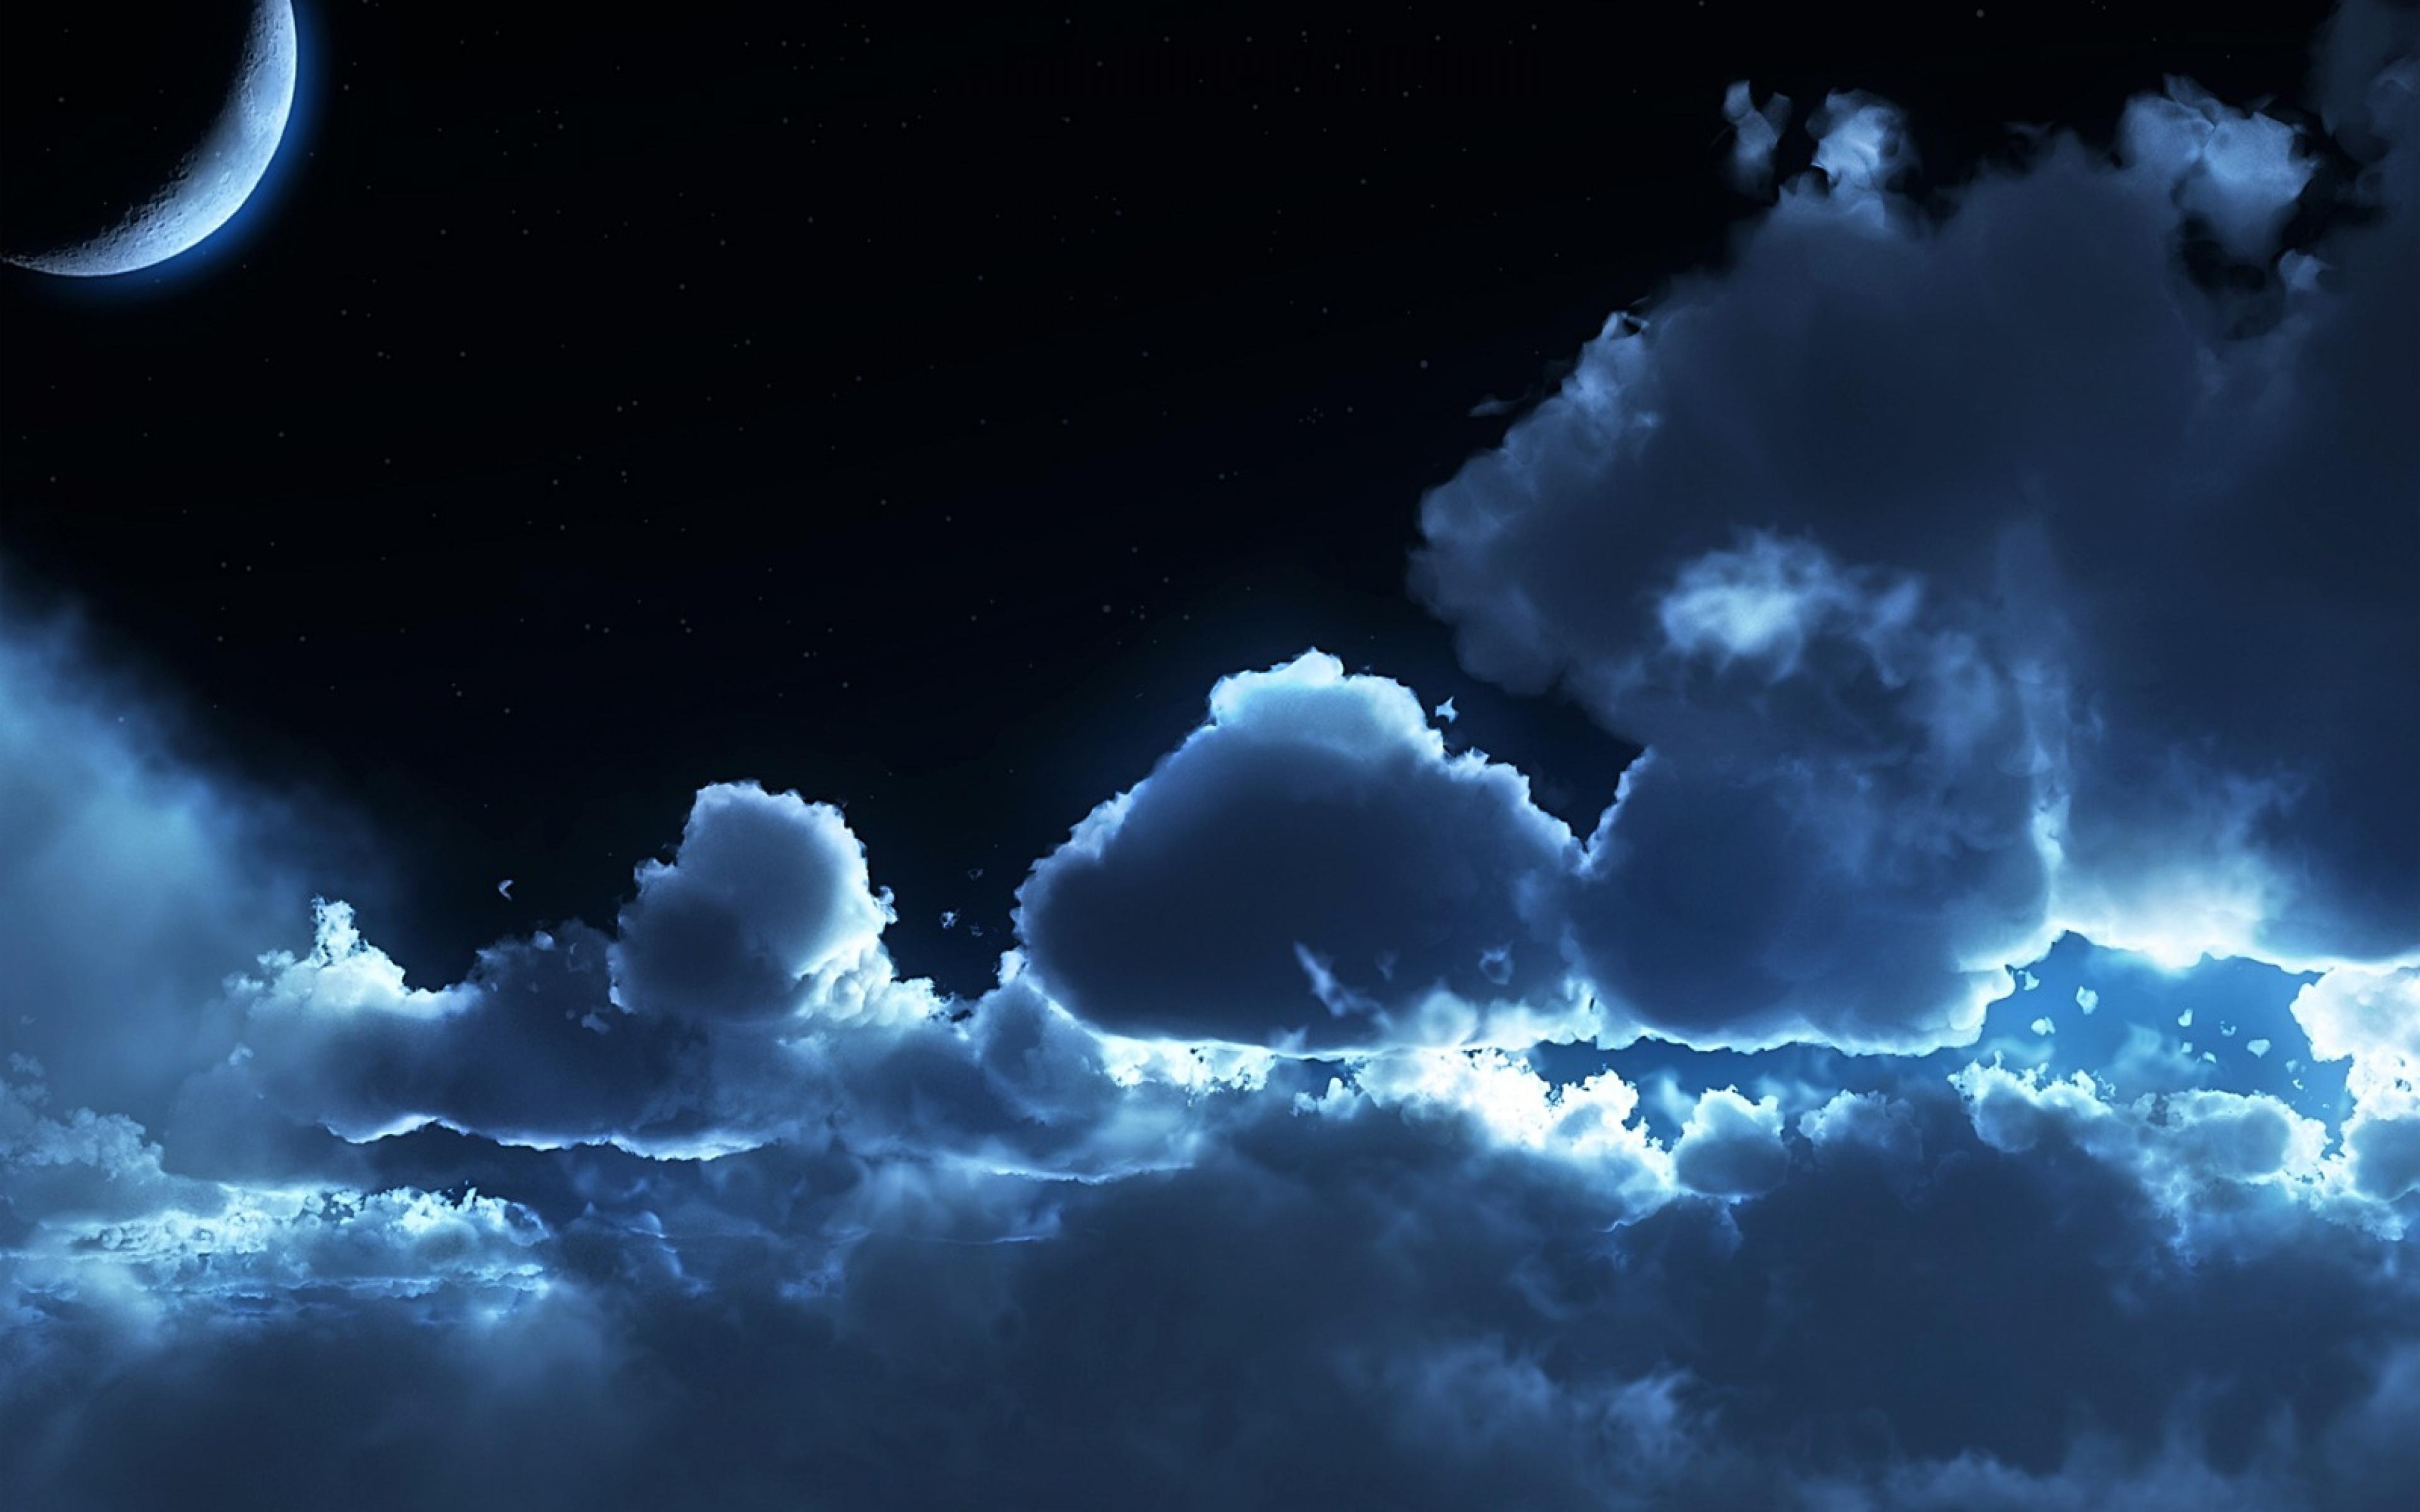 3840x2400 Sky Night Clouds Air Stars Moon Tranquillity Wallpaper 3840x2400